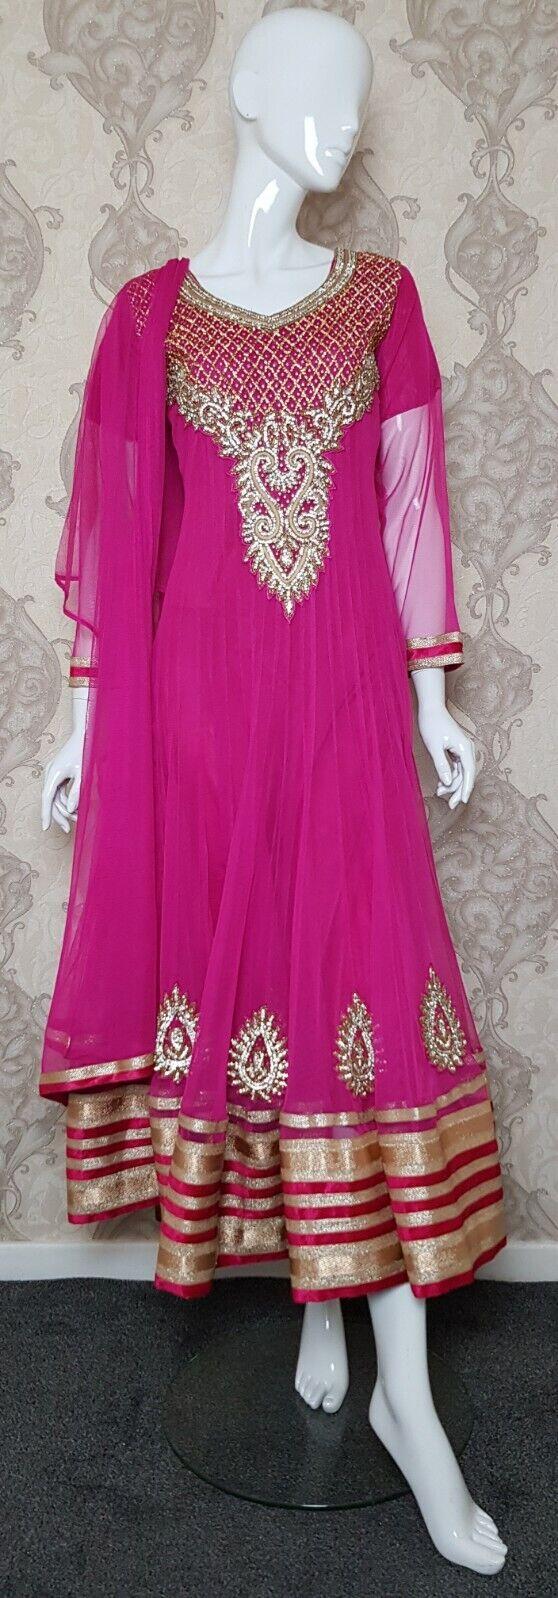 Asian Indian Pakistani Party Wear Wedding Dress Heavy Embroidery